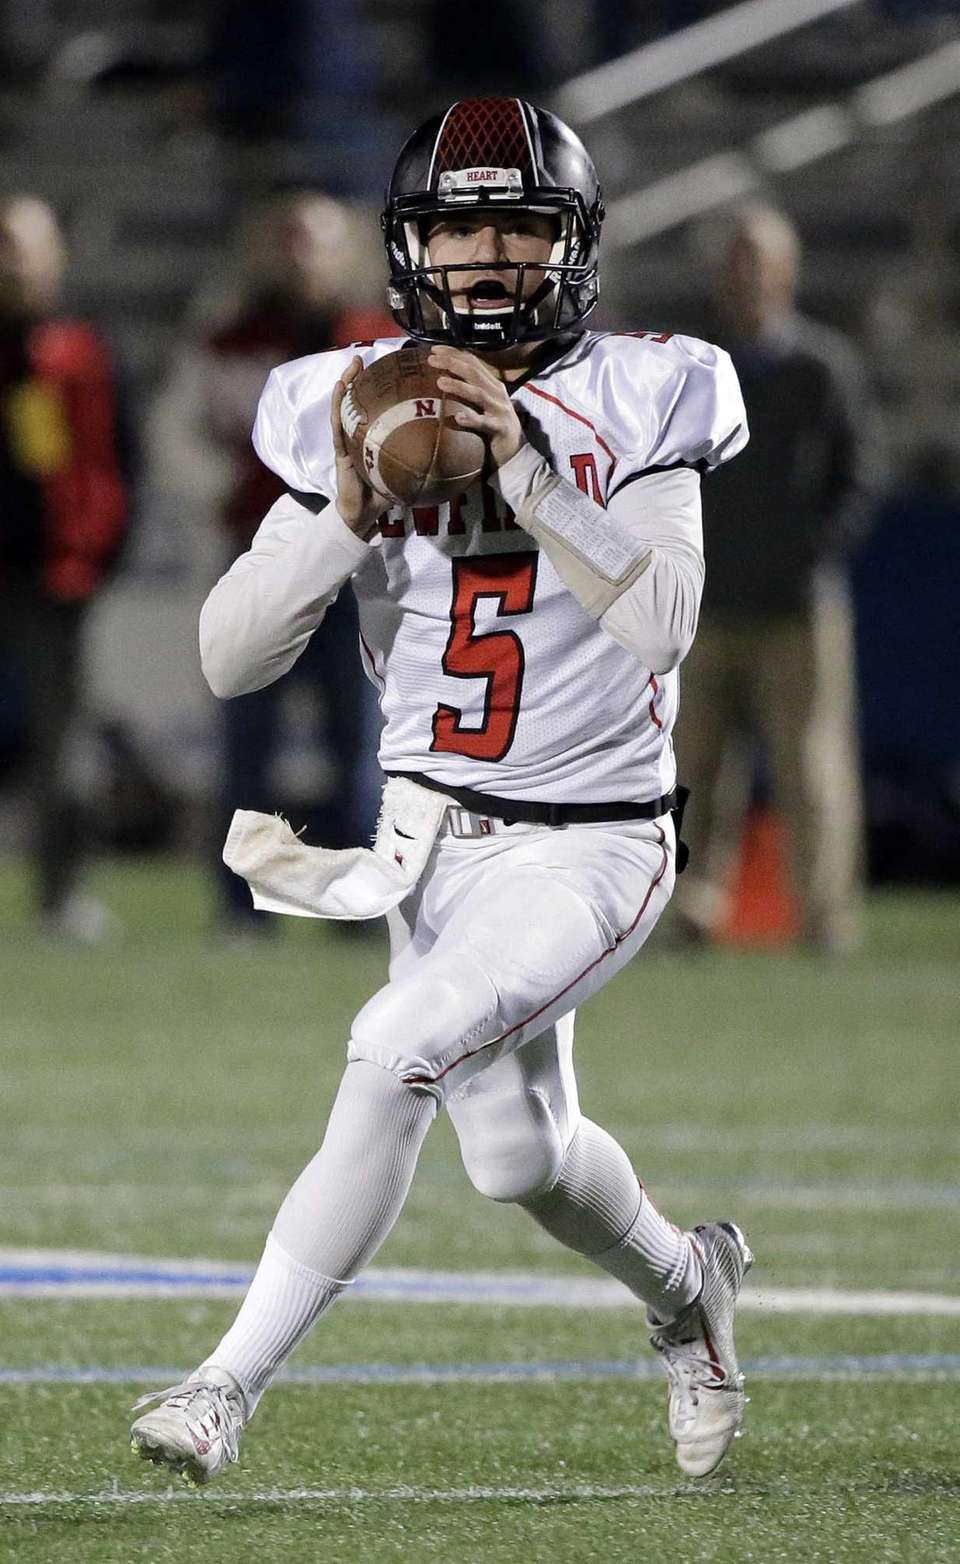 Newfield quarterback Ryan Klemm (5) rolls to the